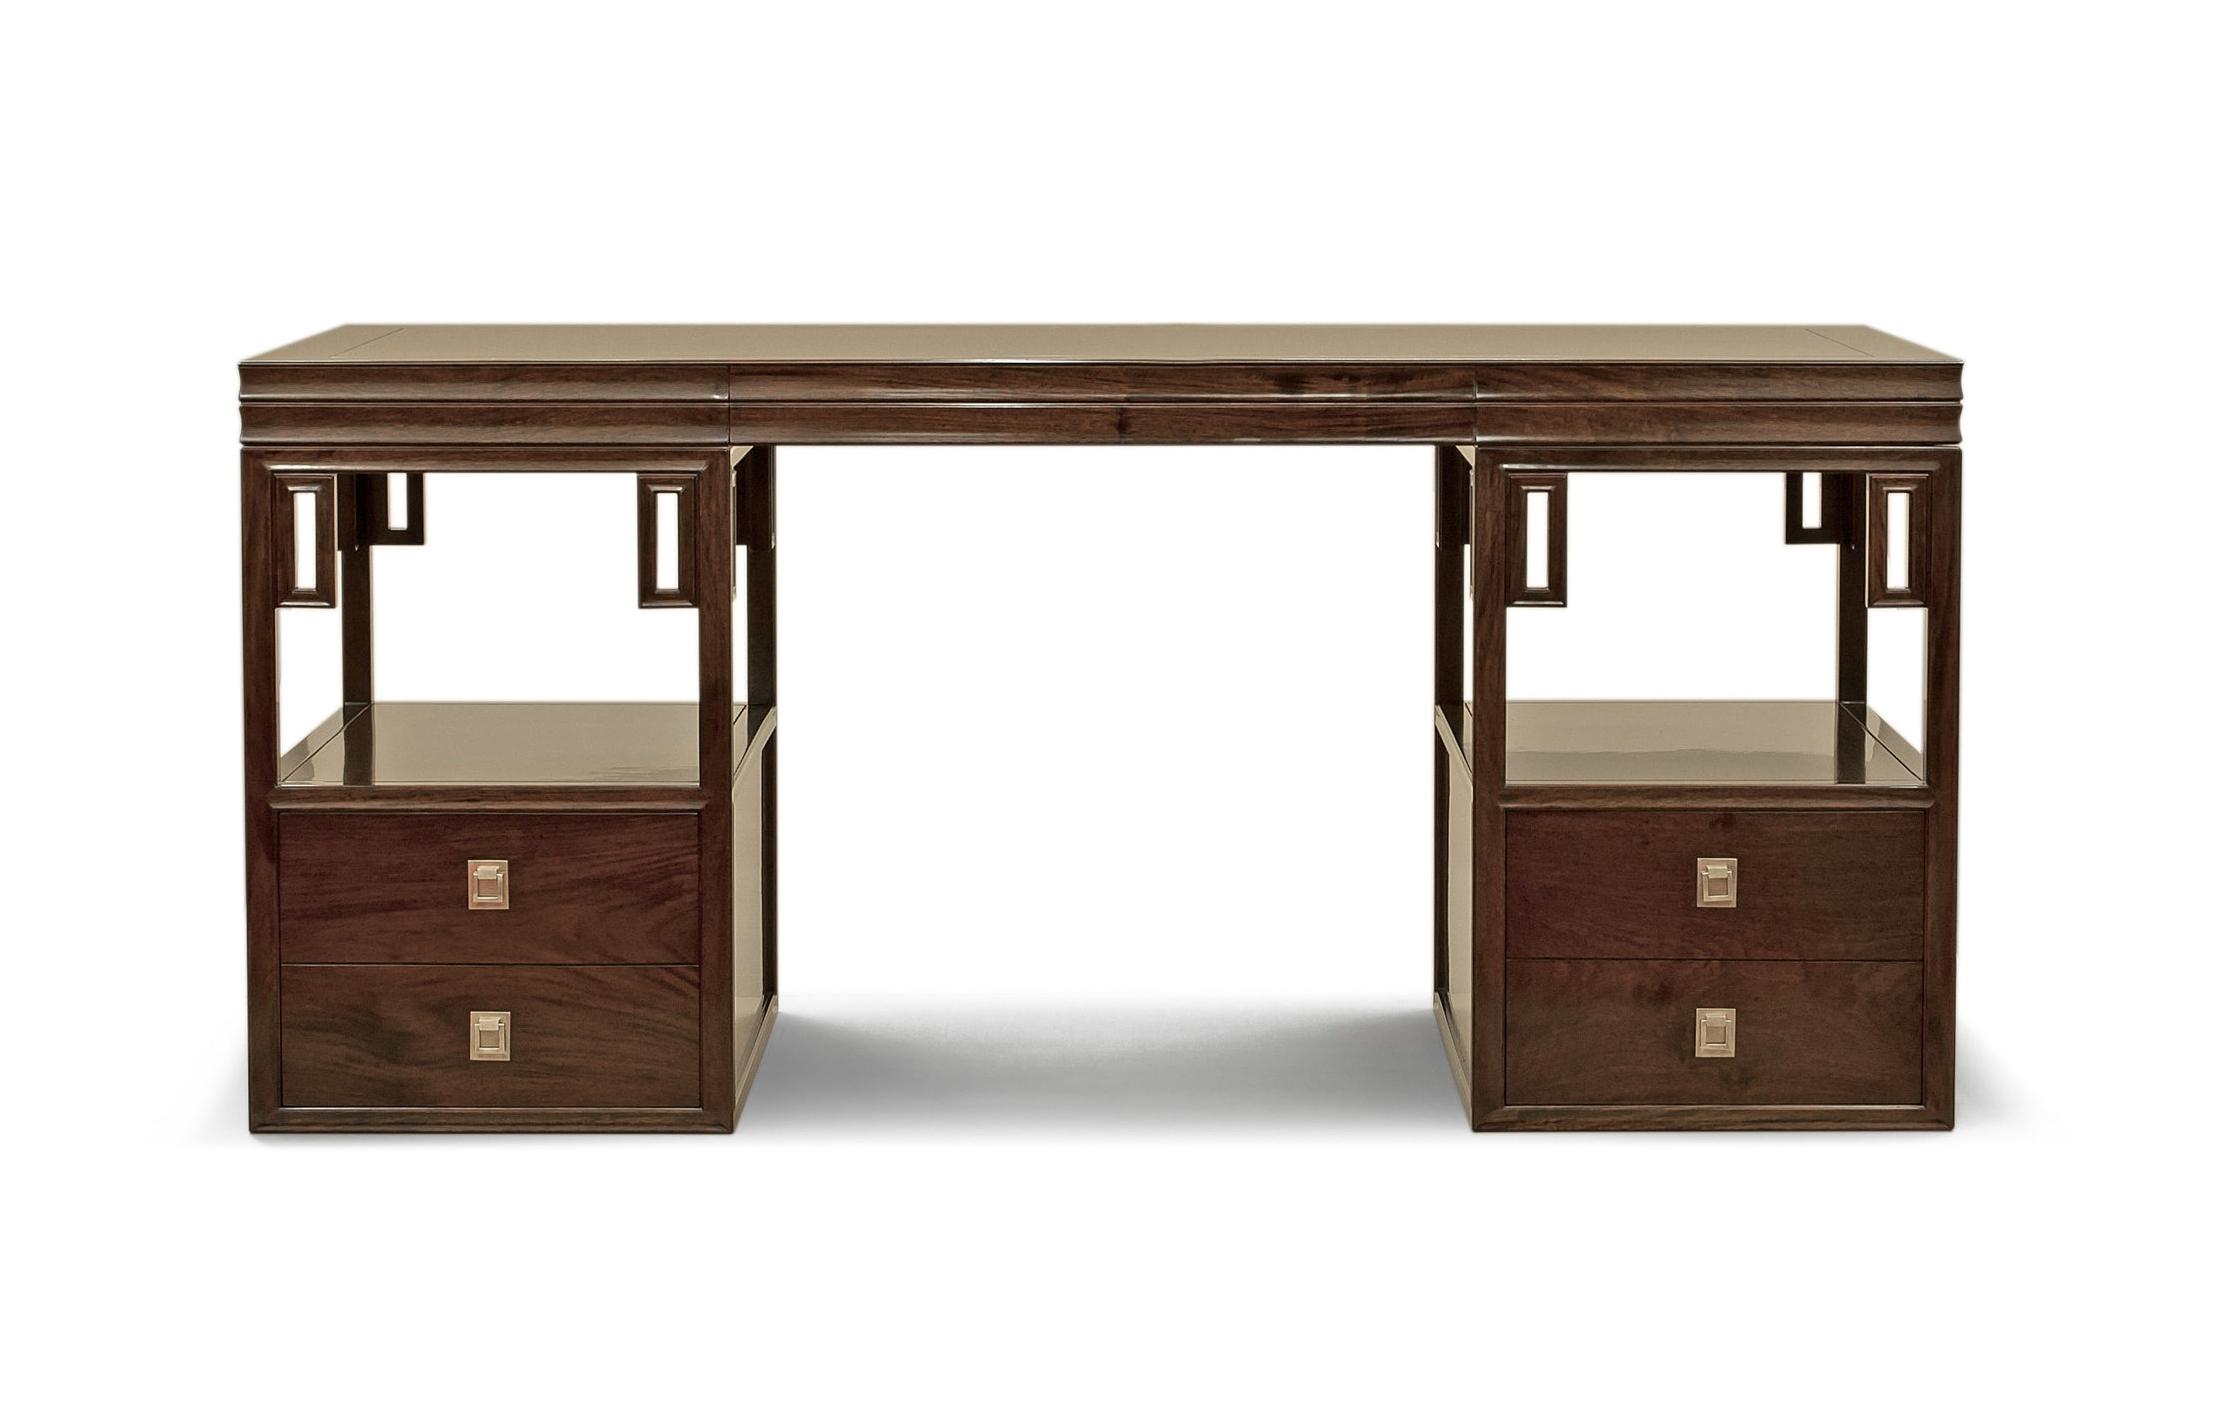 ....Bespoke Ming Style Chinese furniture : Trestle Desk..特别定制明式中式家具: 台架式书桌....